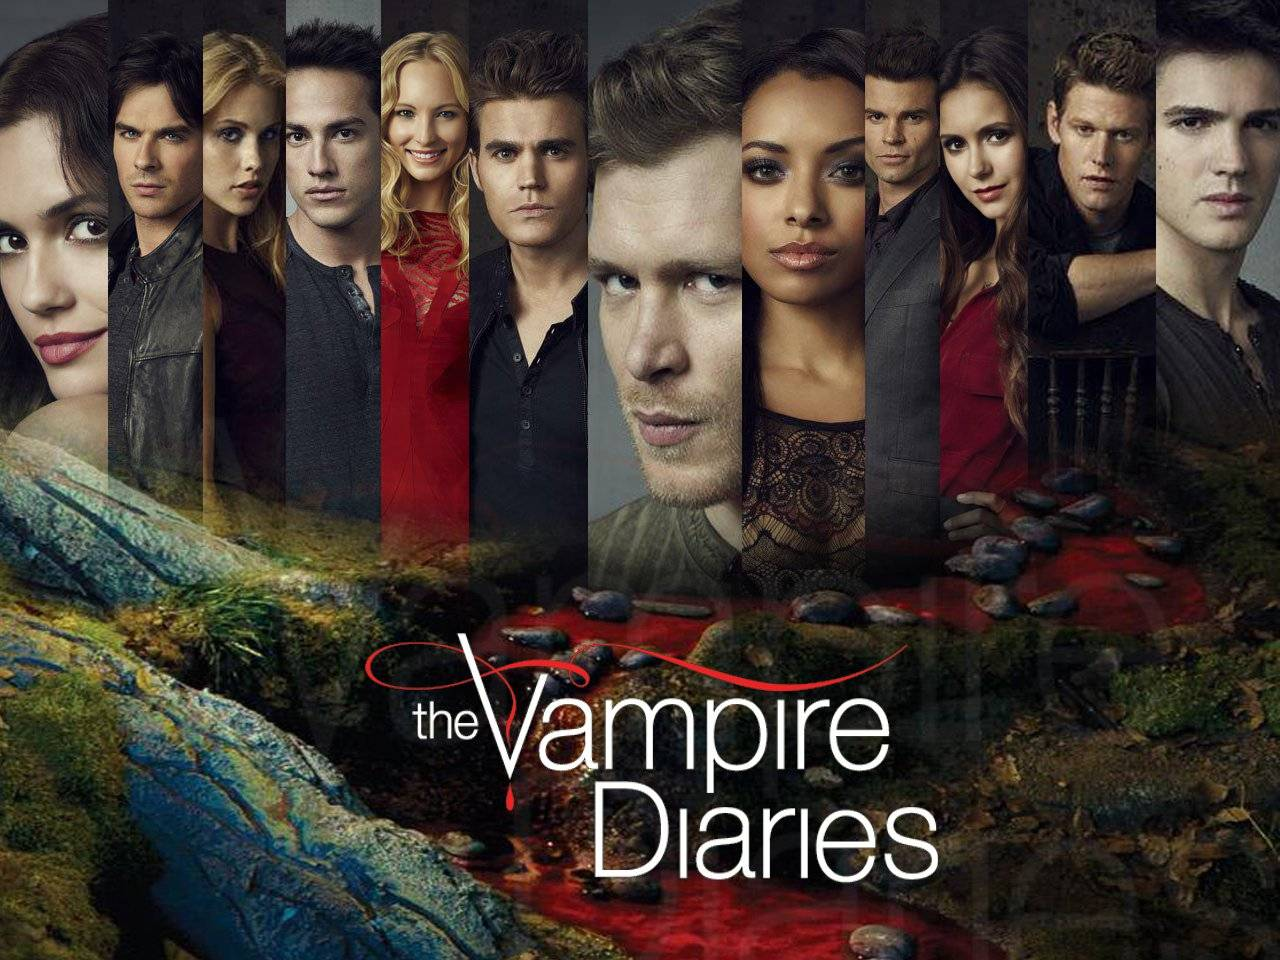 nhat ky ma ca rong phan 1 2009 big - Vampire Diaries Merch